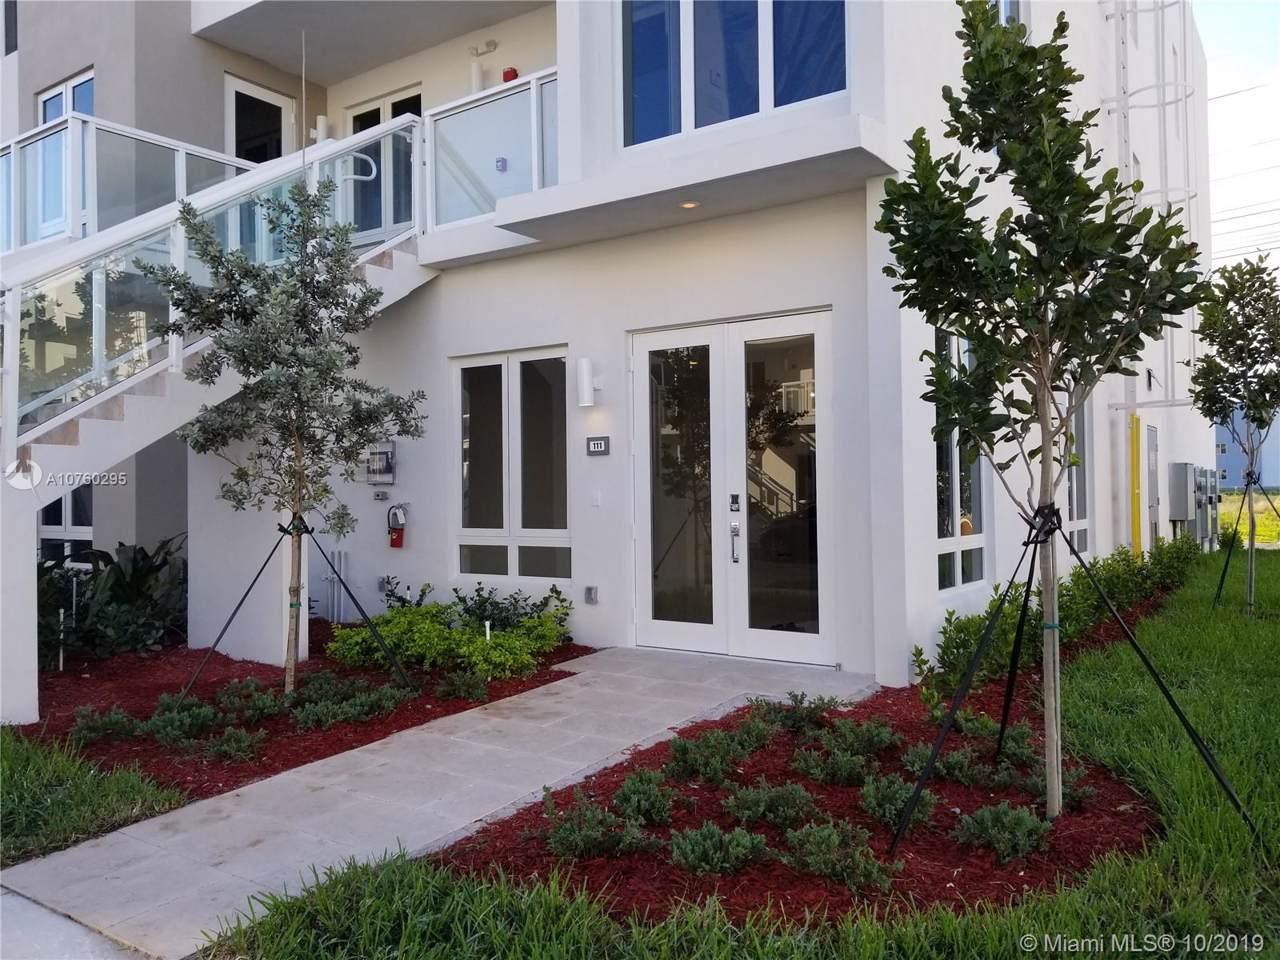 10220 63rd Terrace - Photo 1